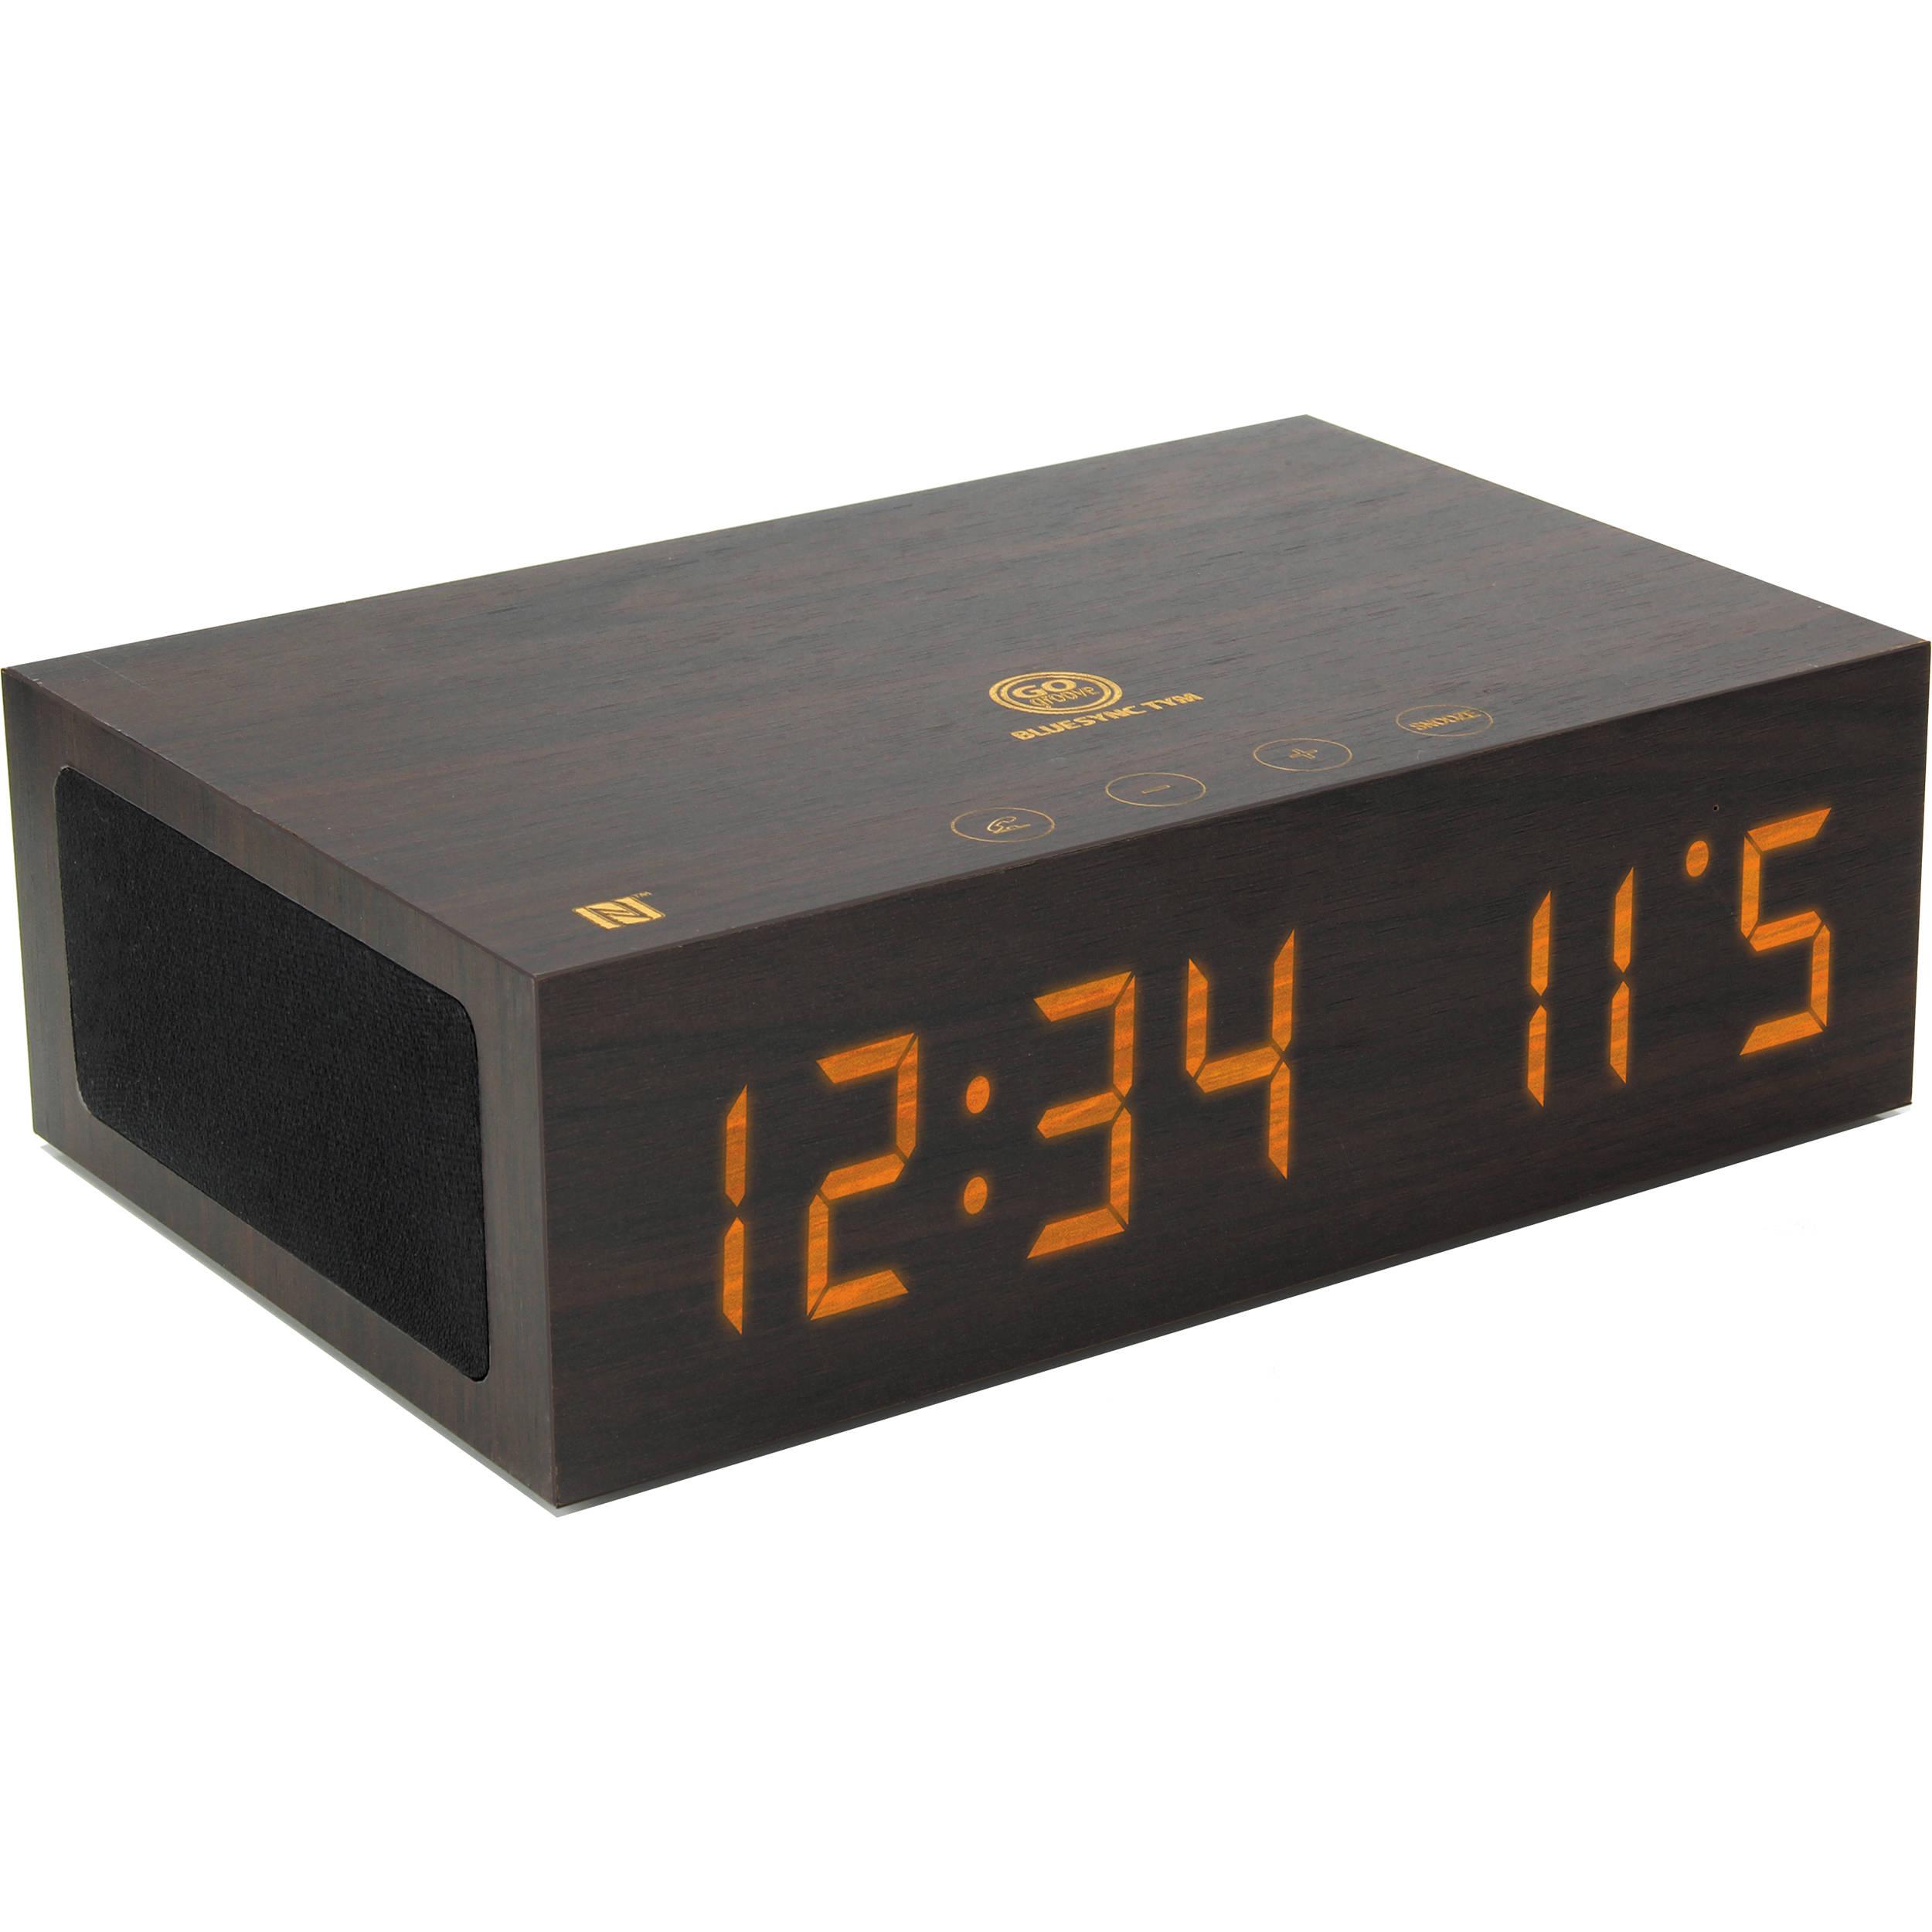 7f24c704988 GOgroove BlueSYNC TYM Bluetooth Speaker with Integrated Alarm Clock (Dark  Wood)